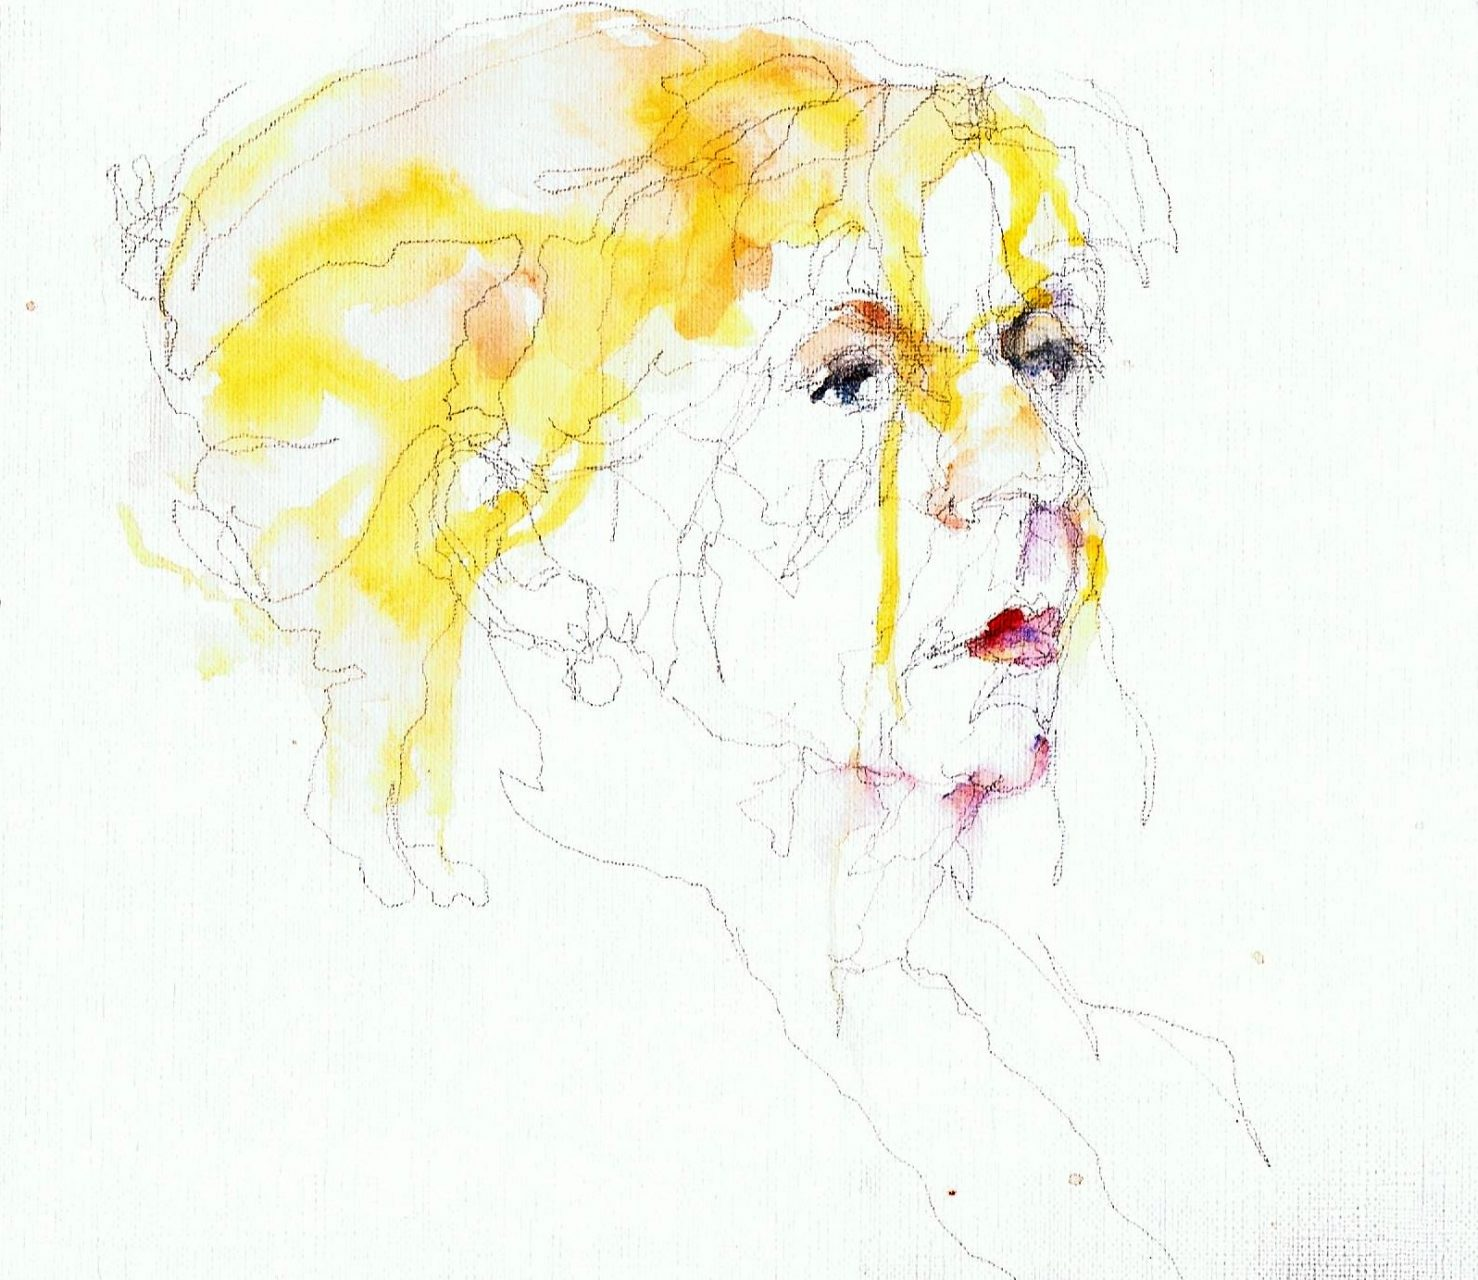 365 dagen een portret Inge Nijhof, model Aquarel 19c25